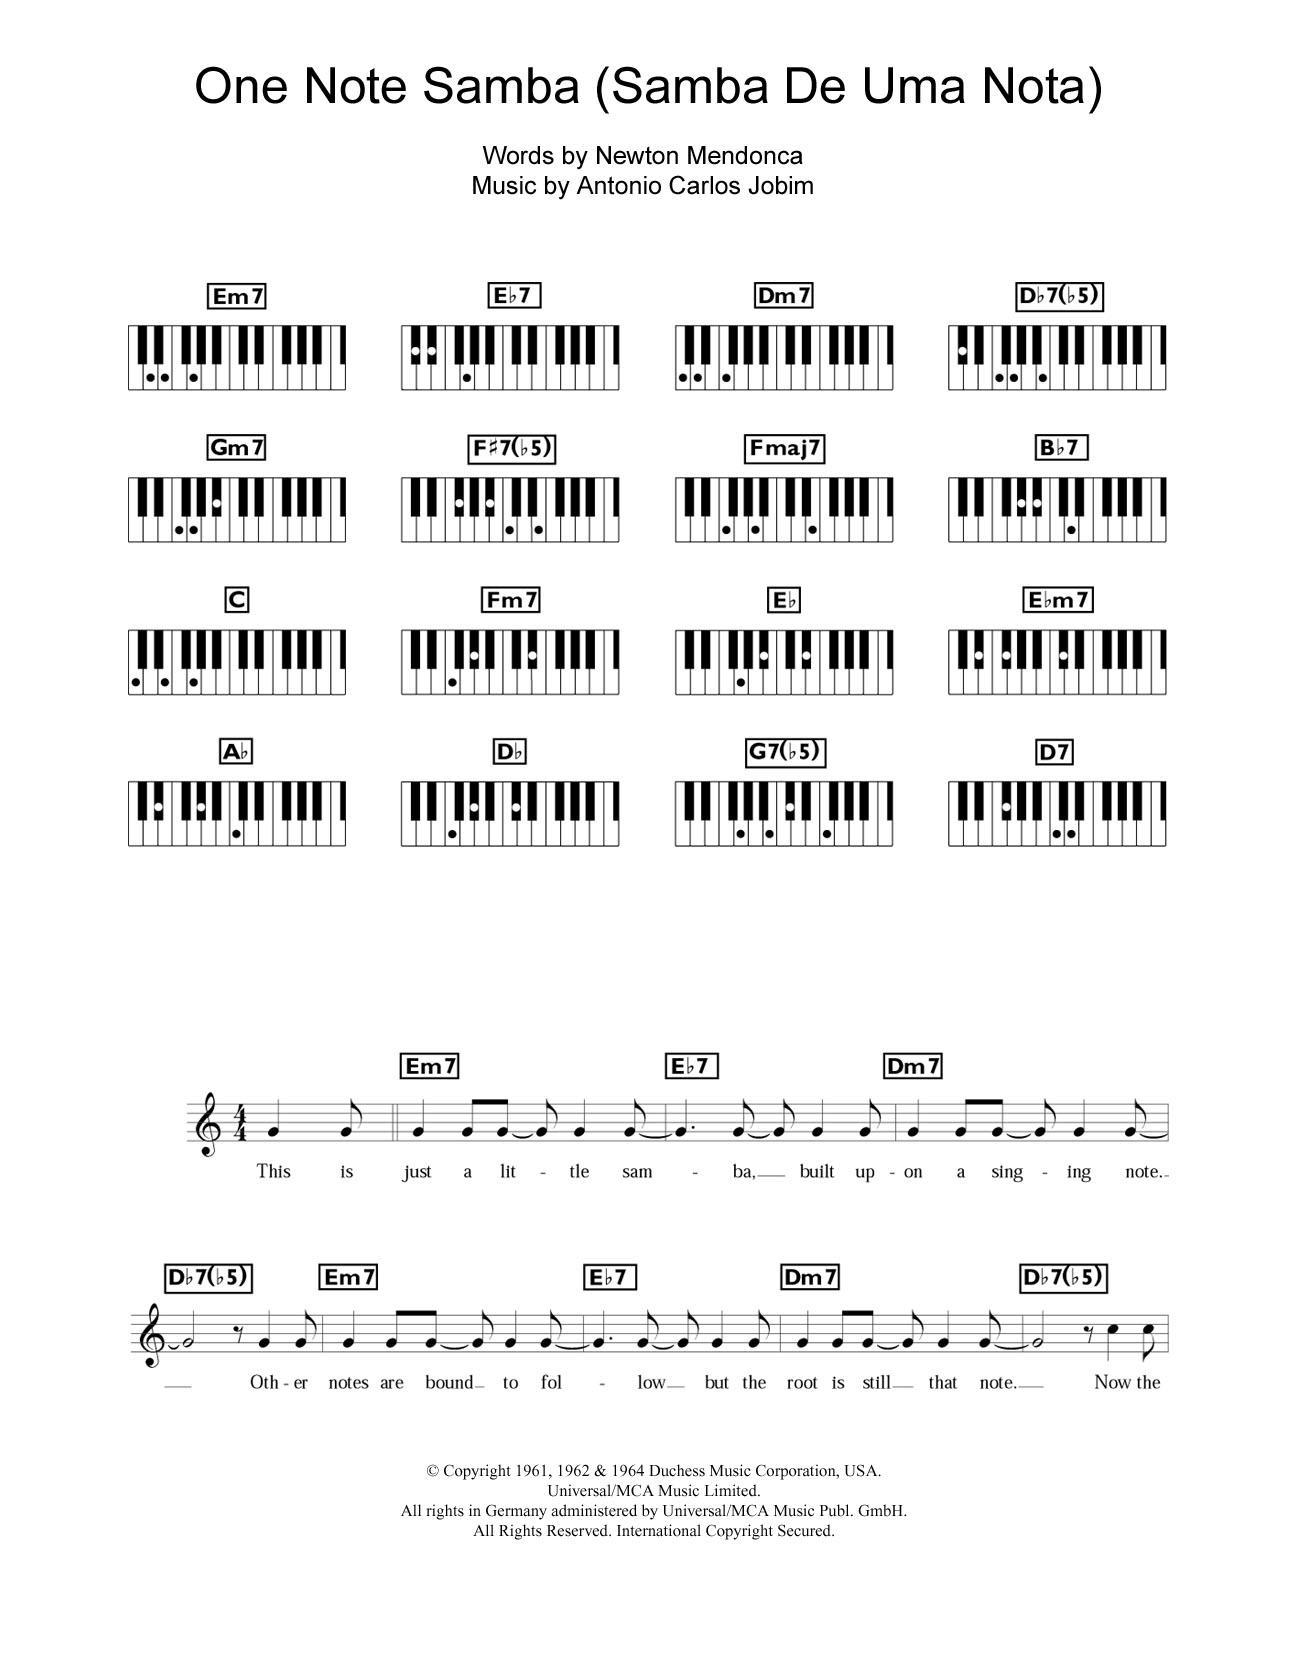 One Note Samba (Samba De Uma Nota) Sheet Music